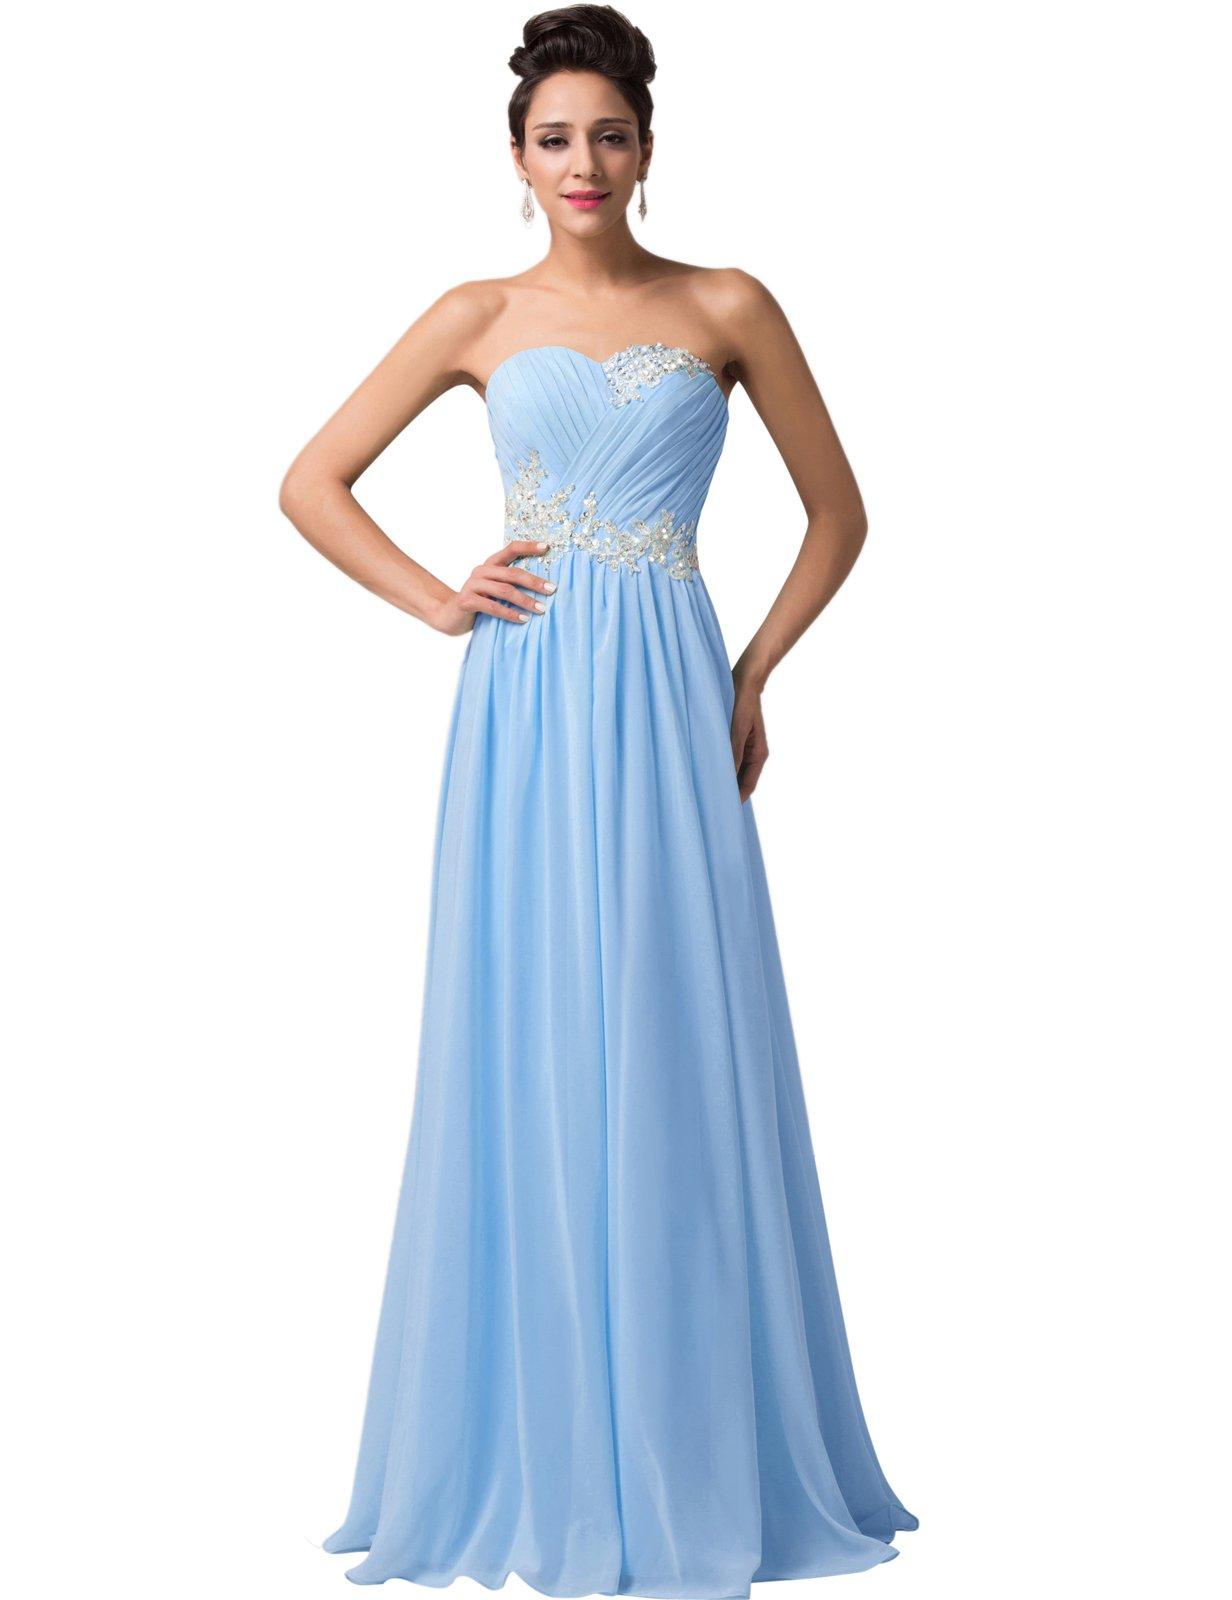 GRACE KARIN Women Long Evening Wedding Dress Chiffon Ball Gowns Prom Bridesmaid With Applique